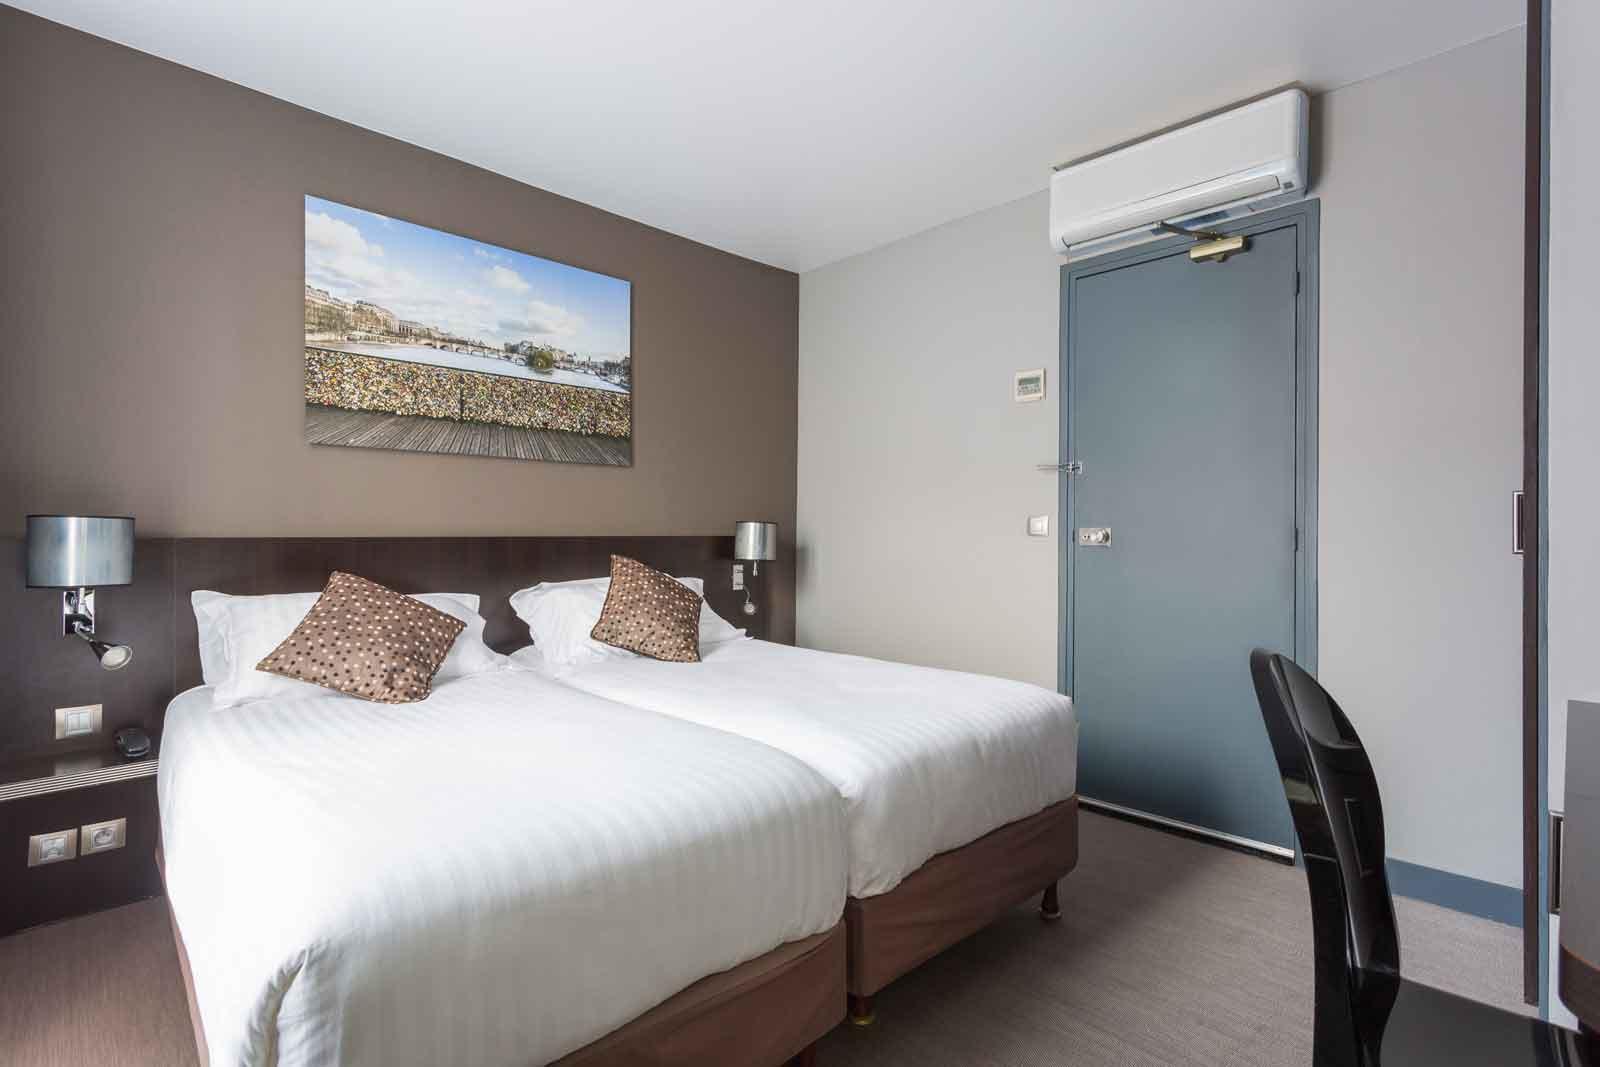 Single Room With 2 Beds Jardin De Villiers Hotel Paris 17th